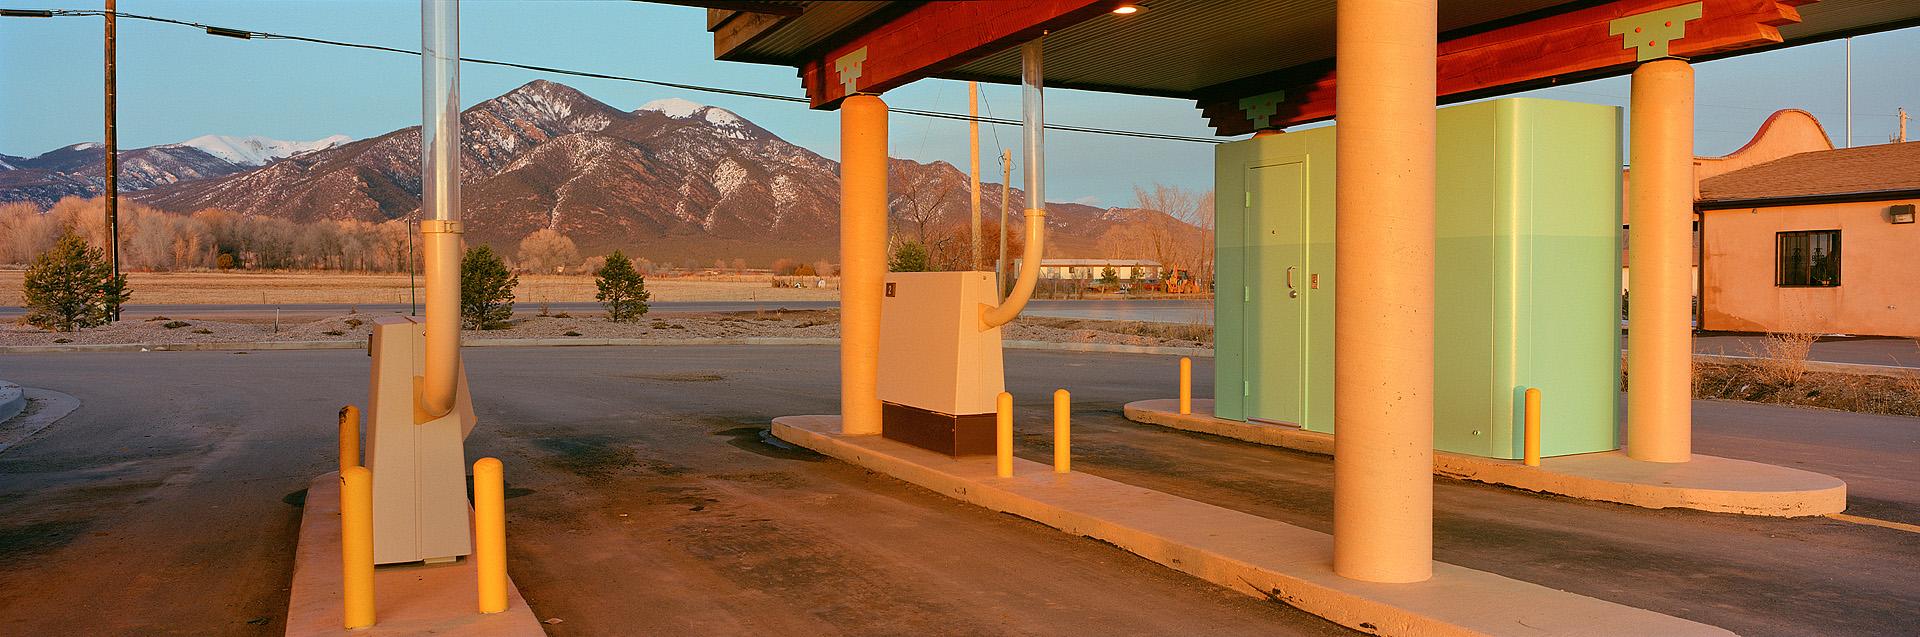 Taos Drivethru